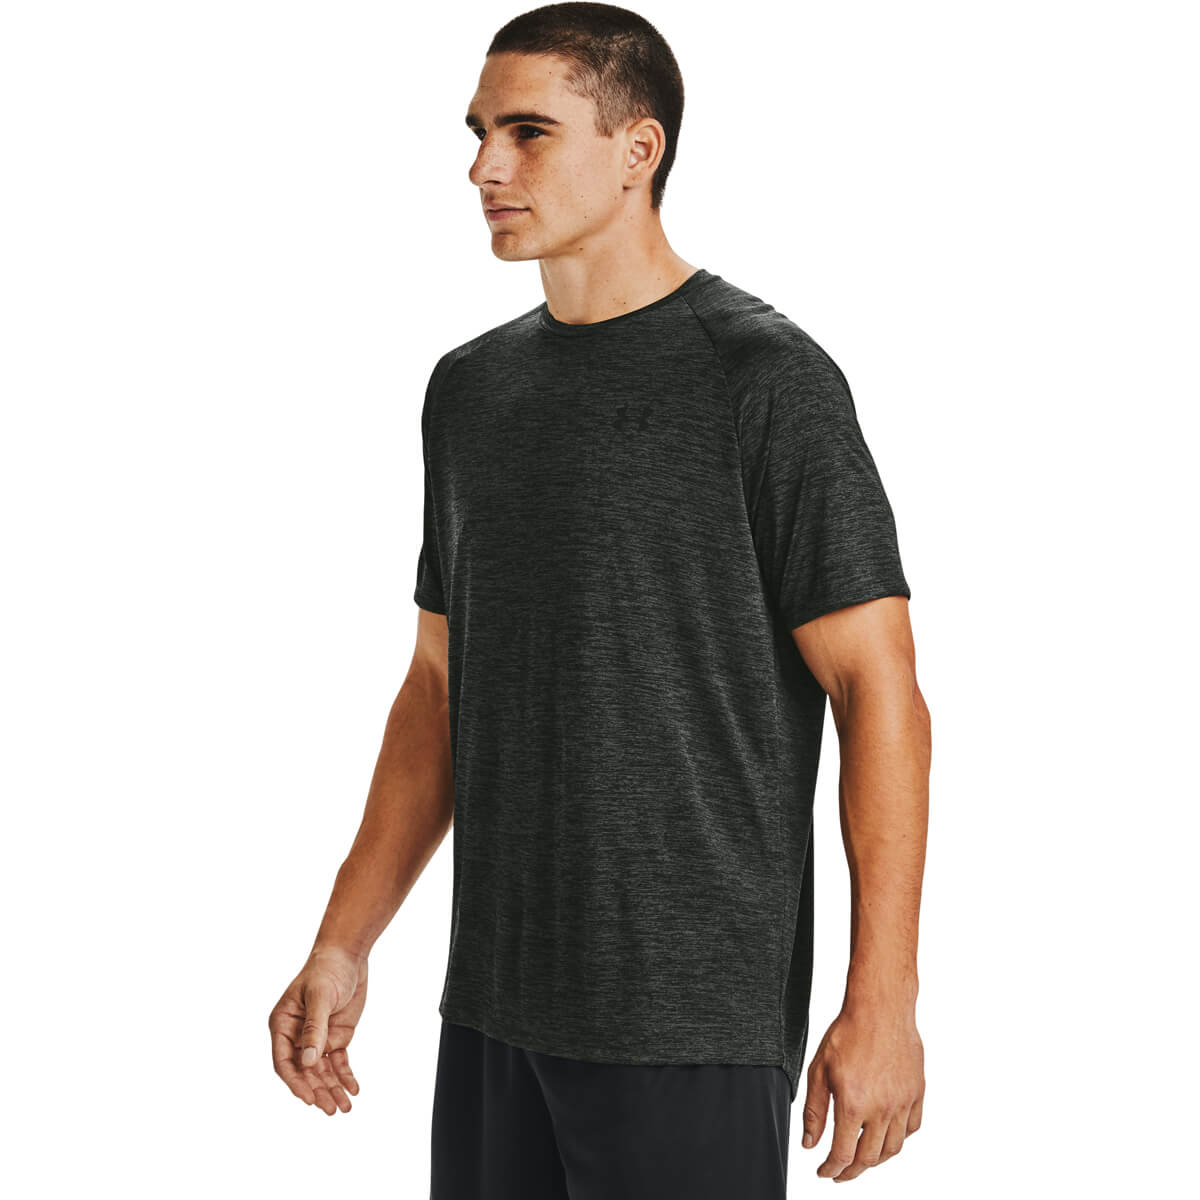 Under Armour Tech 2.0 Trænings T-shirt Herre